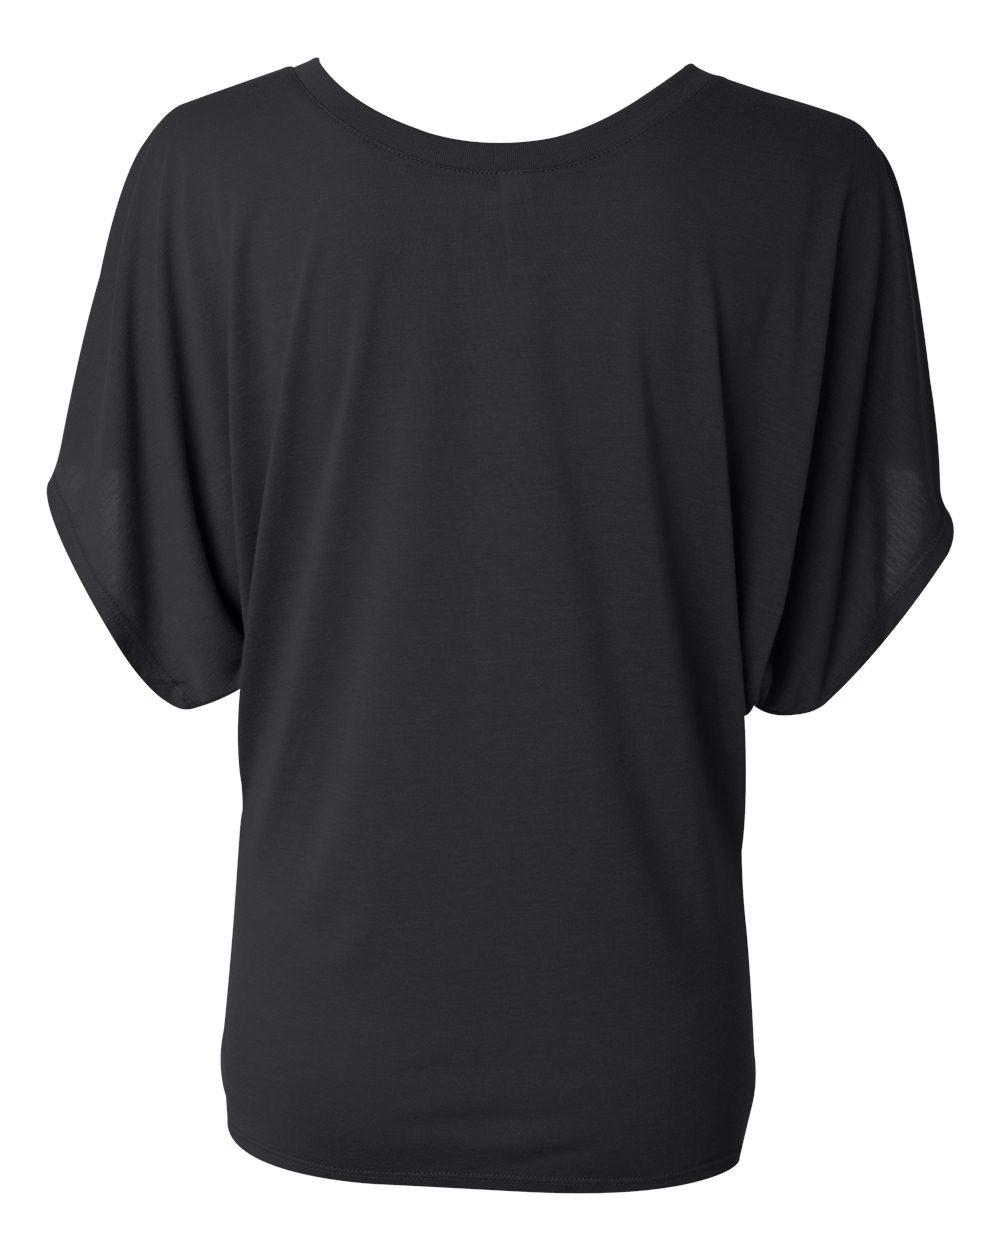 Bella-Canvas-Women-039-s-Flowy-Draped-Sleeve-Dolman-T-Shirt-8821-S-2XL thumbnail 4